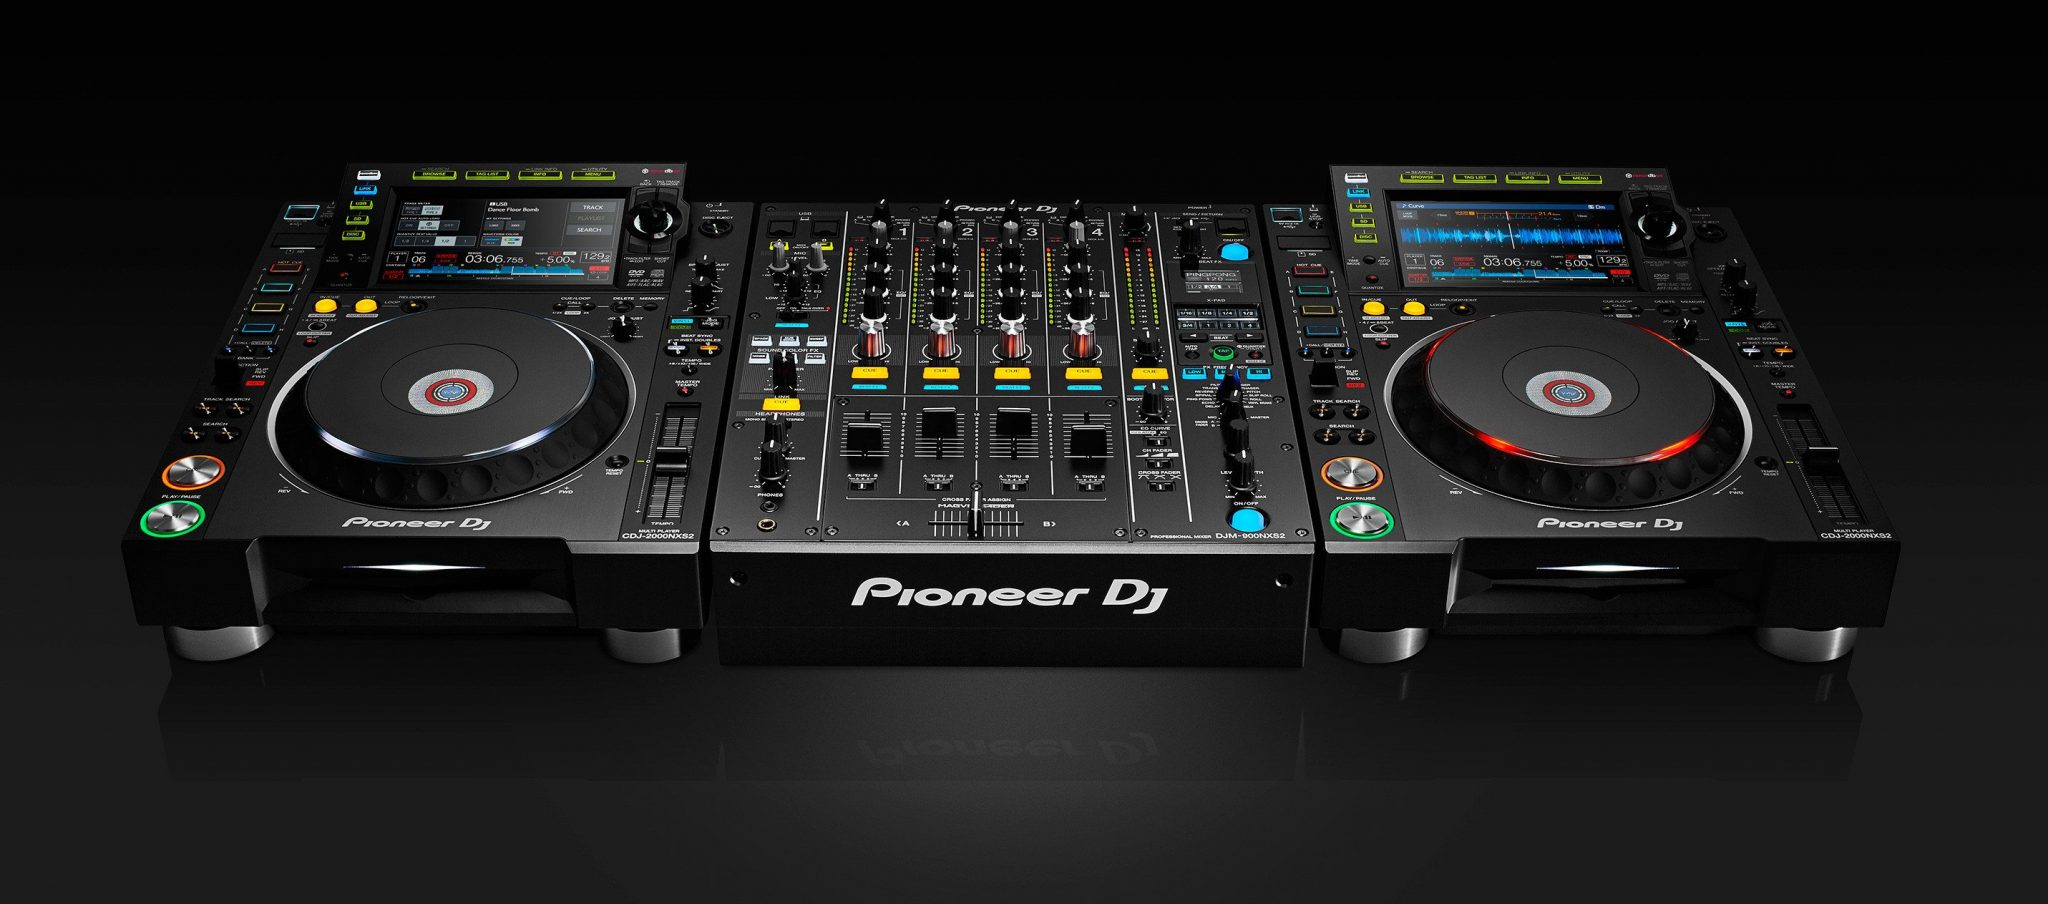 New Pioneer Dj Djm 900nxs2 And Cdj 2000nxs2 Djworx